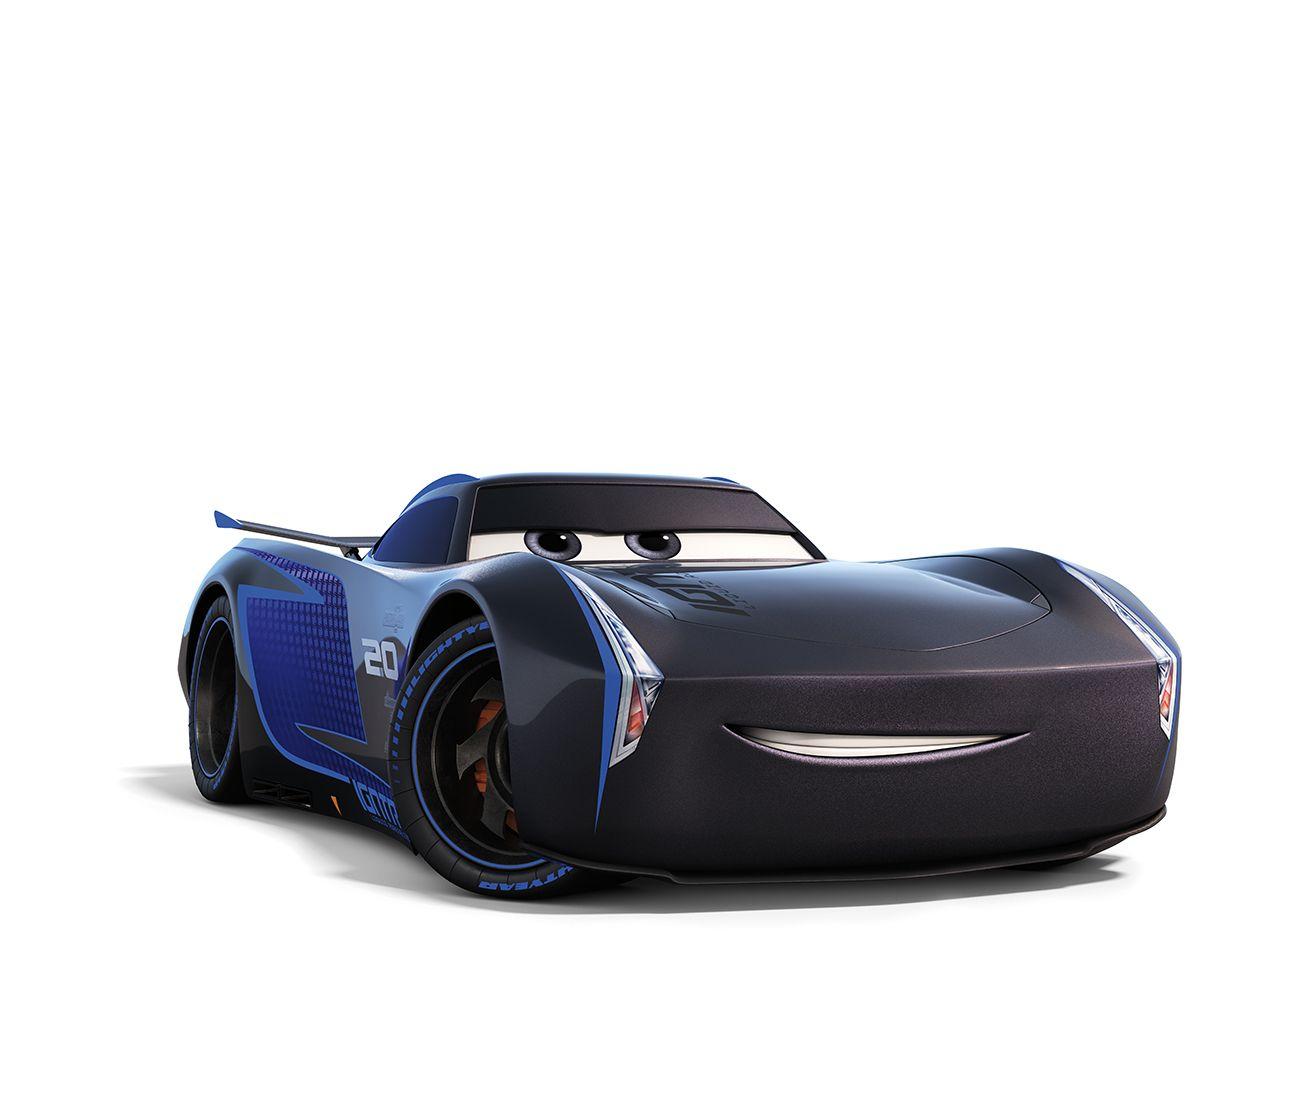 cars 3 jackson storm disney pinterest storms and cars. Black Bedroom Furniture Sets. Home Design Ideas